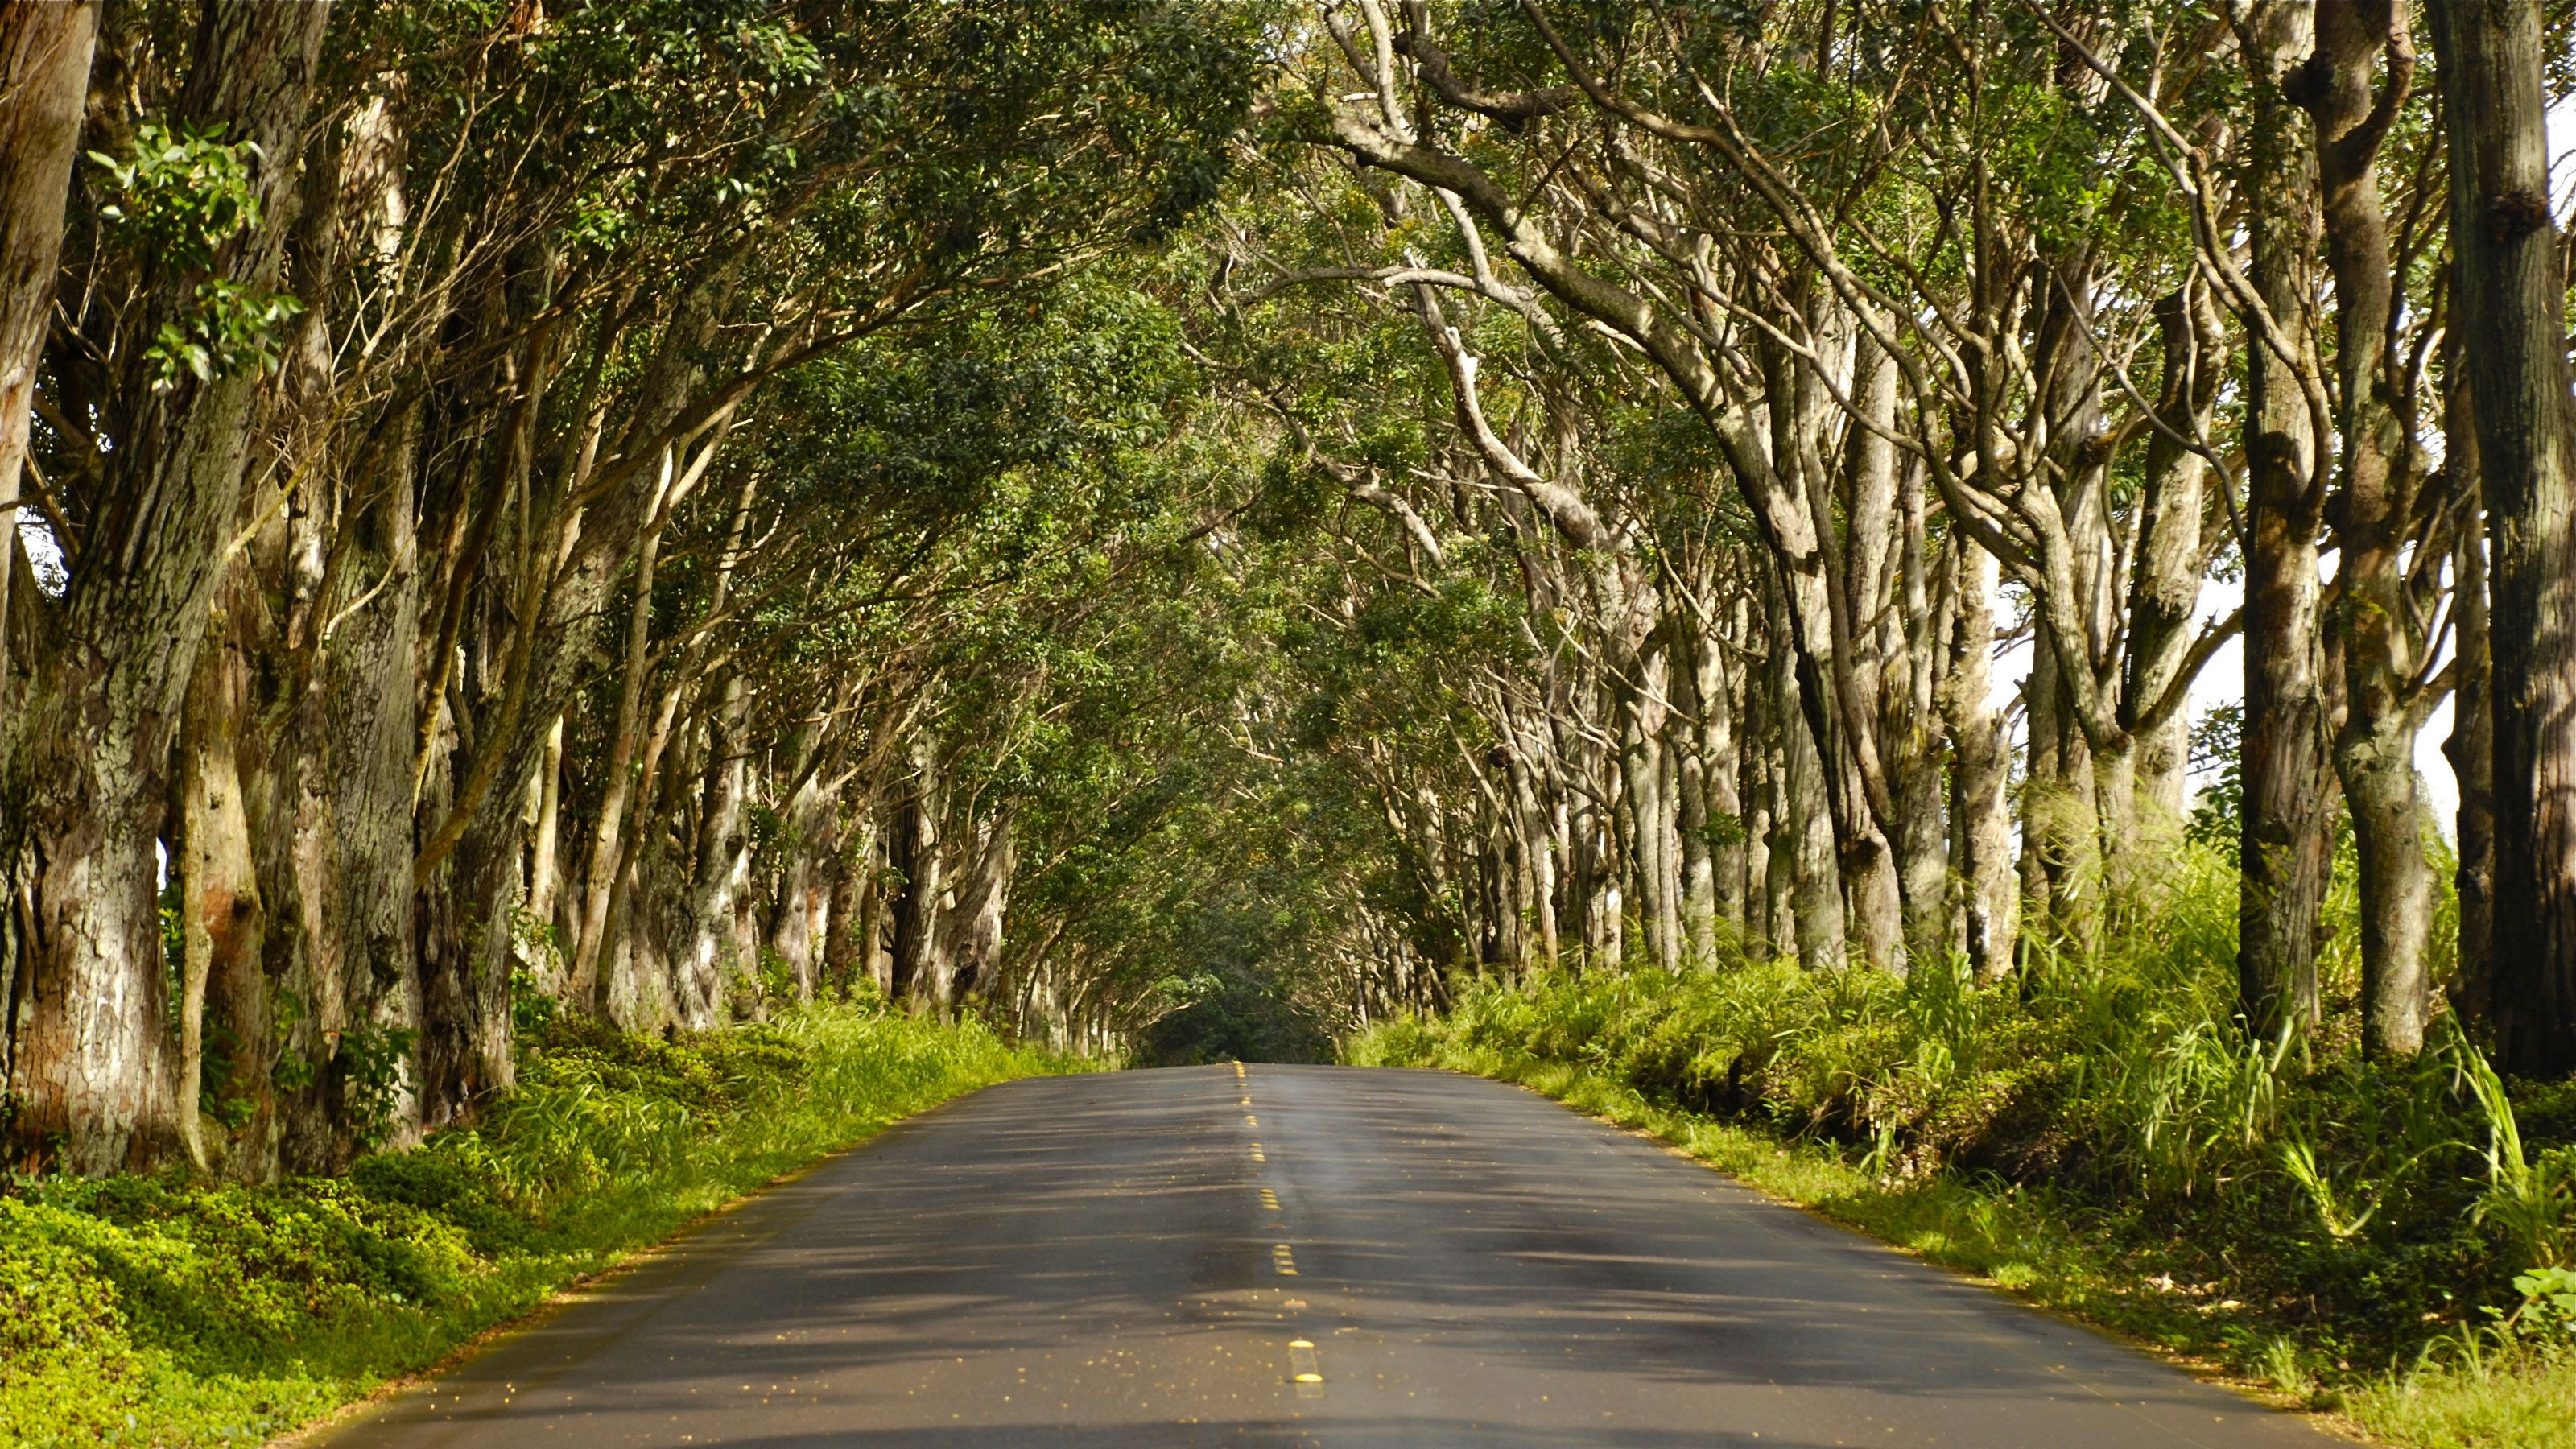 tree lined road in Waimea Canyon in Kauai